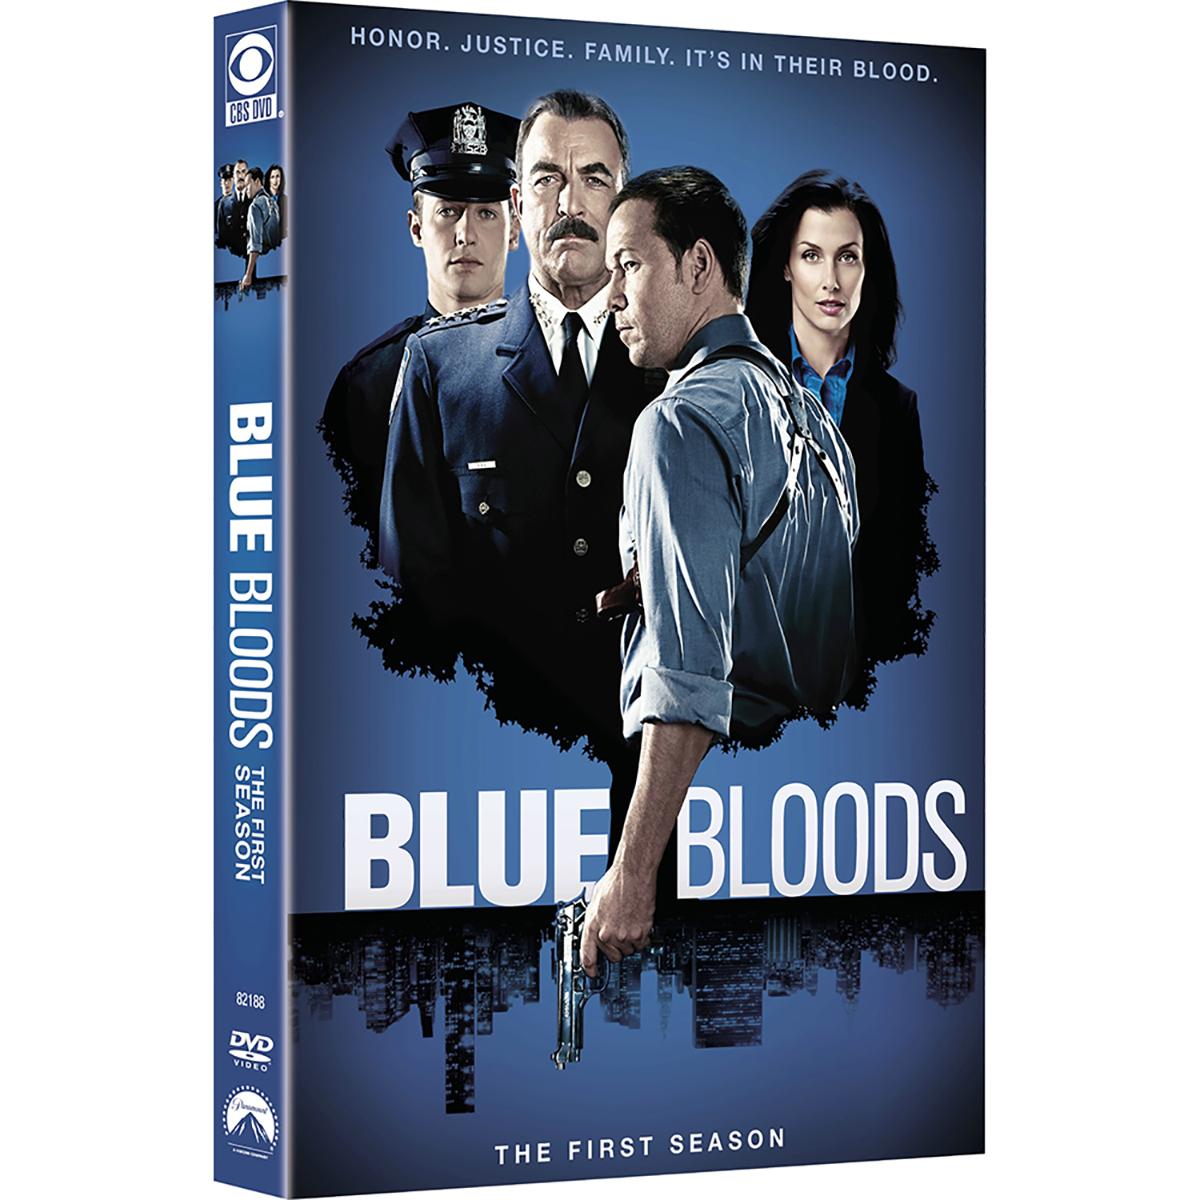 Blue Bloods: Season 1 DVD -  DVDs & Videos 6445-432934